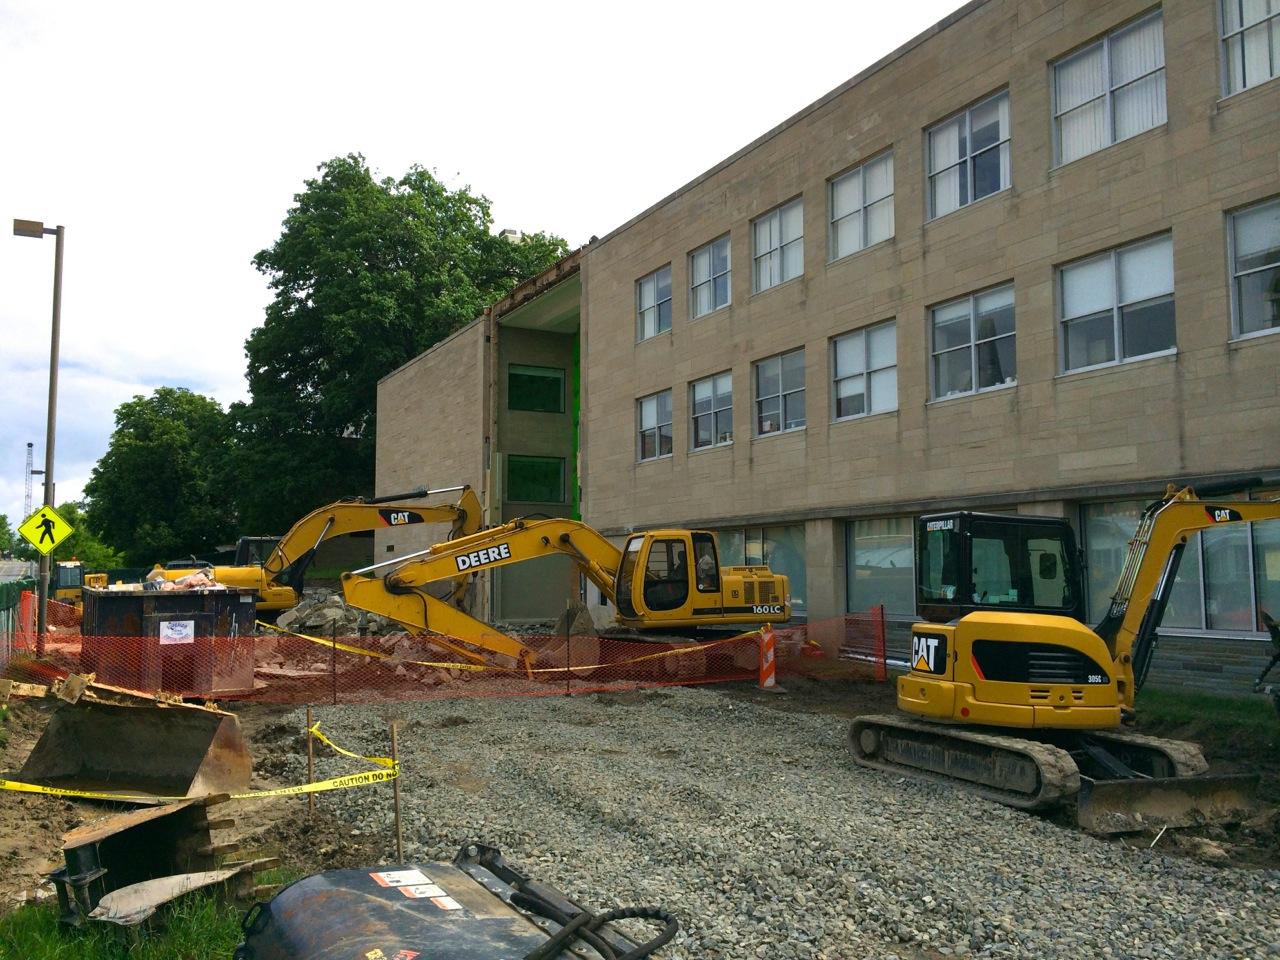 Statler-Hall-Entrance-Cornell-Ithaca-0615142